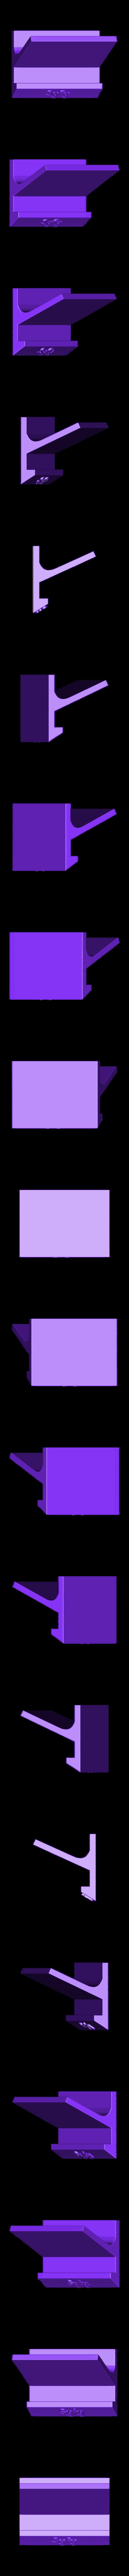 Stand_01.stl Download free STL file Dark Matter - Main Title Logo • 3D printer object, SYFY